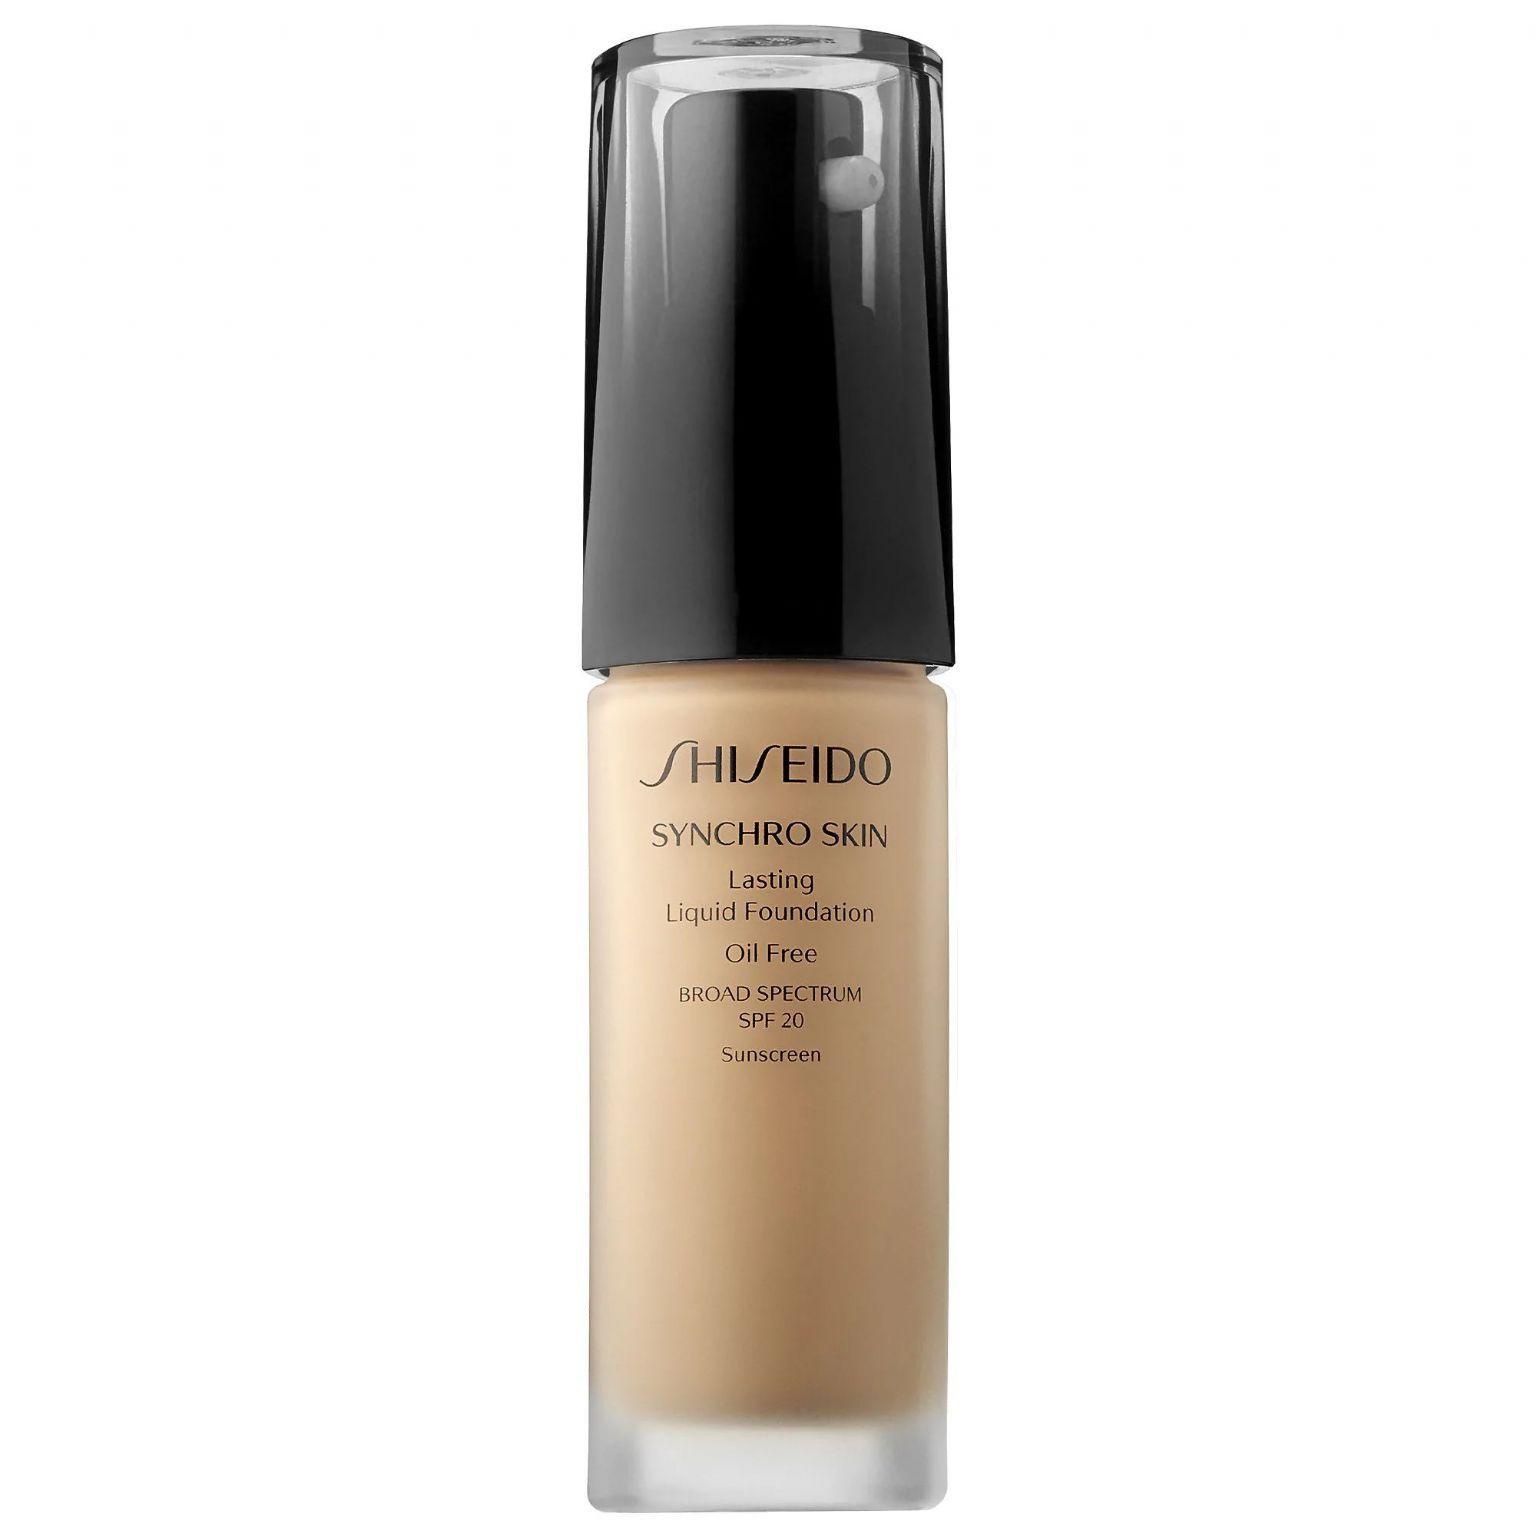 Shiseido Synchro Skin Lasting Liquid Oil Free Foundation Reviews Photos Ingredients Makeupalley